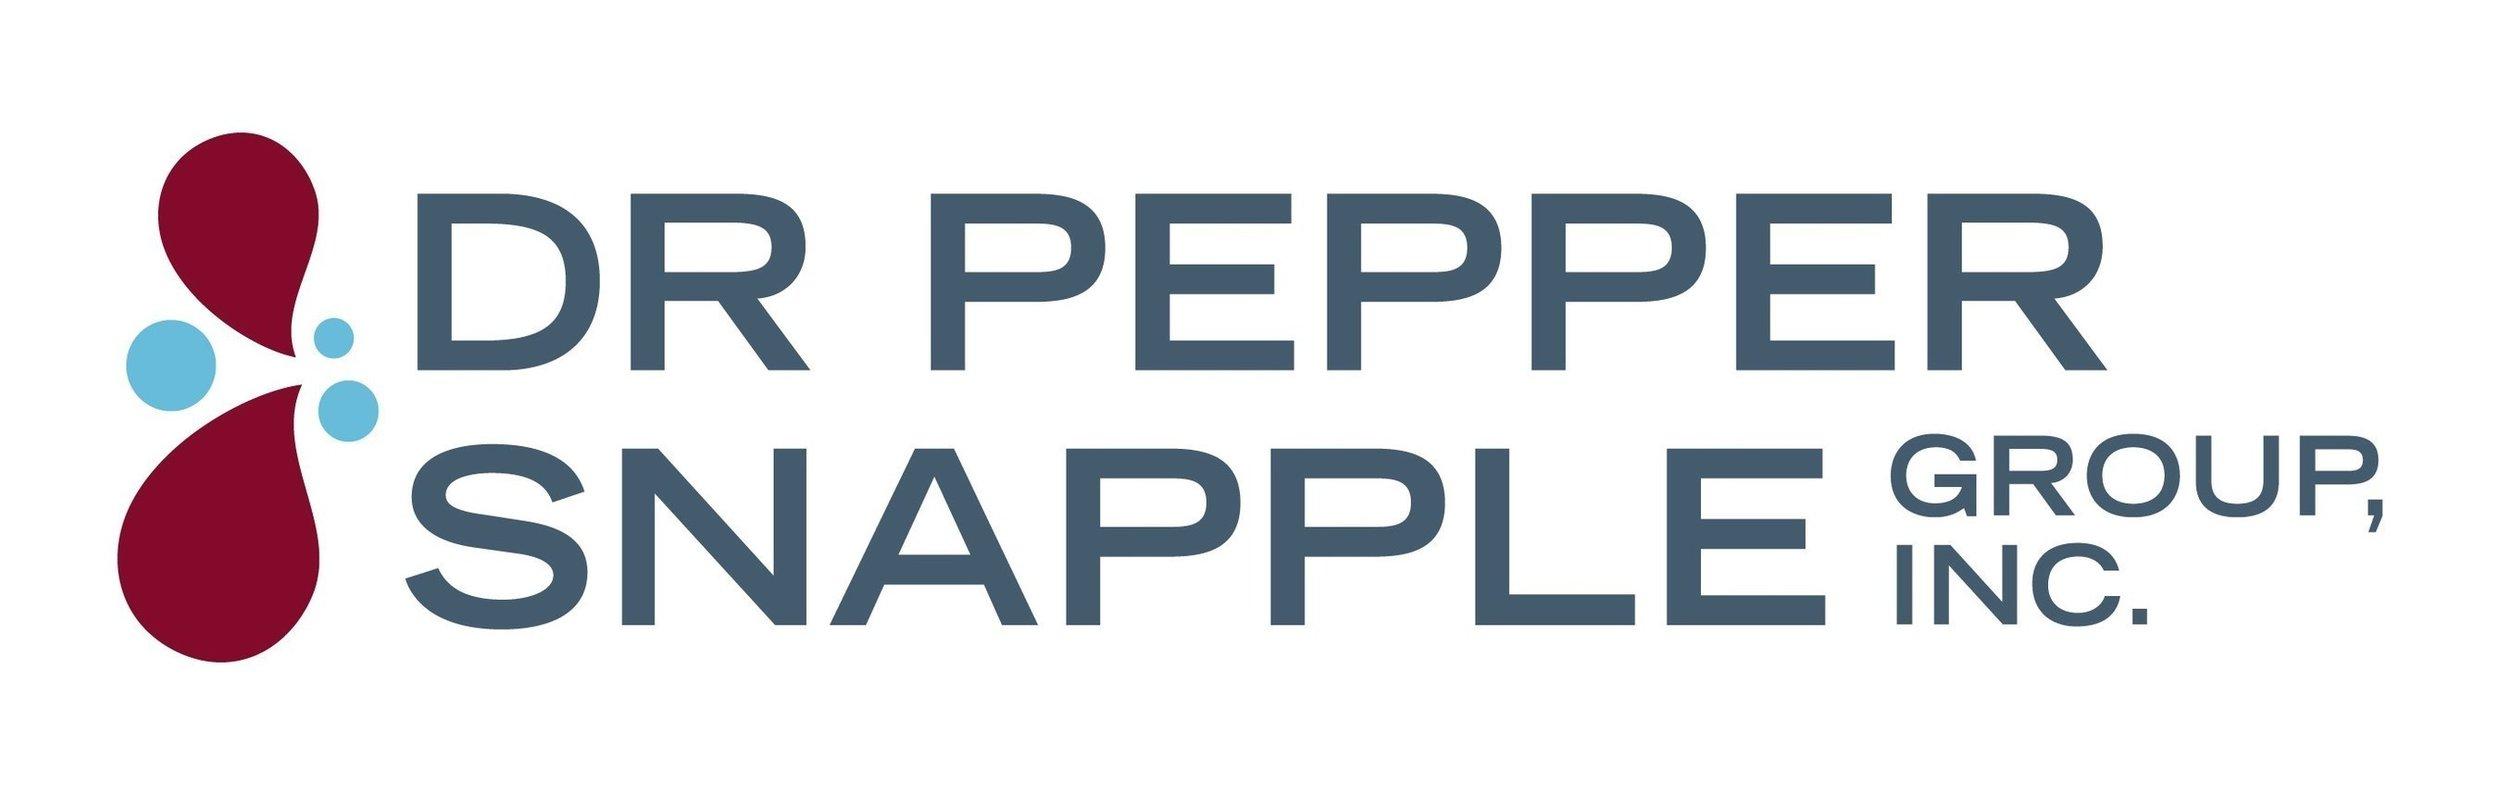 Dr. Pepper Snapple Group